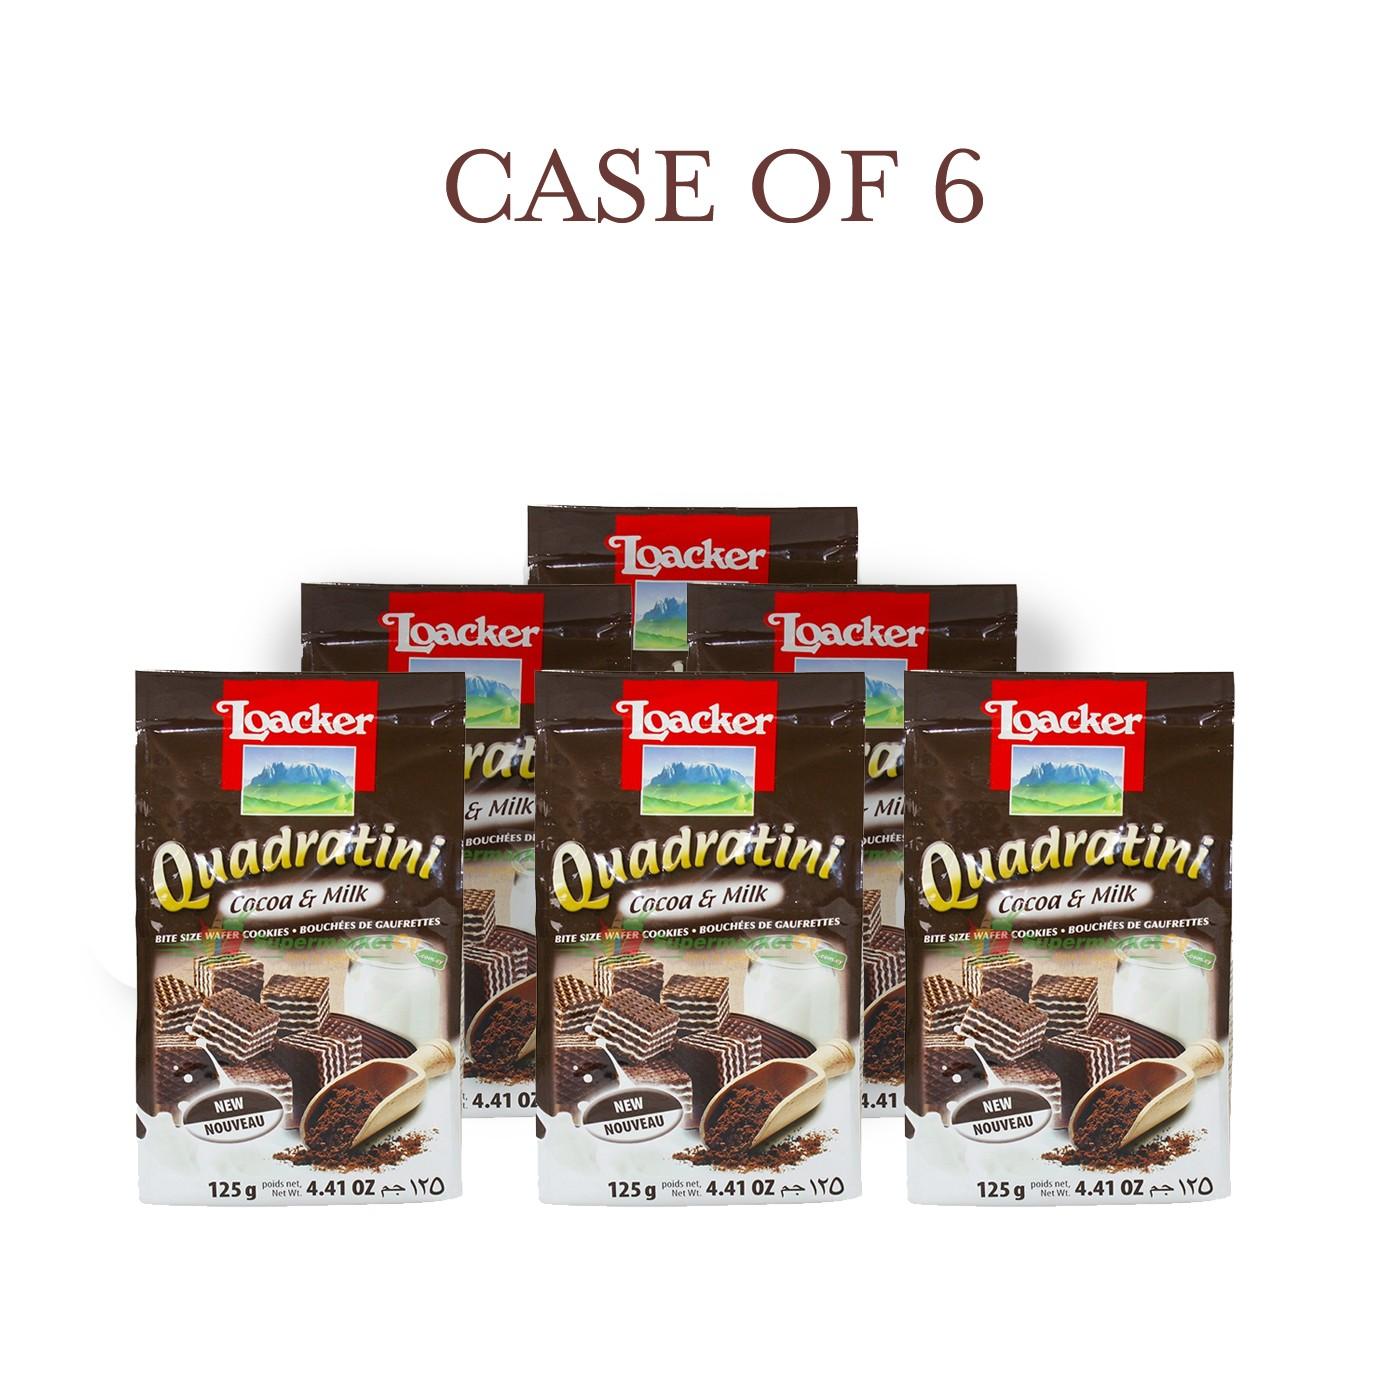 Cocoa-Milk Quadratini - Case of 6